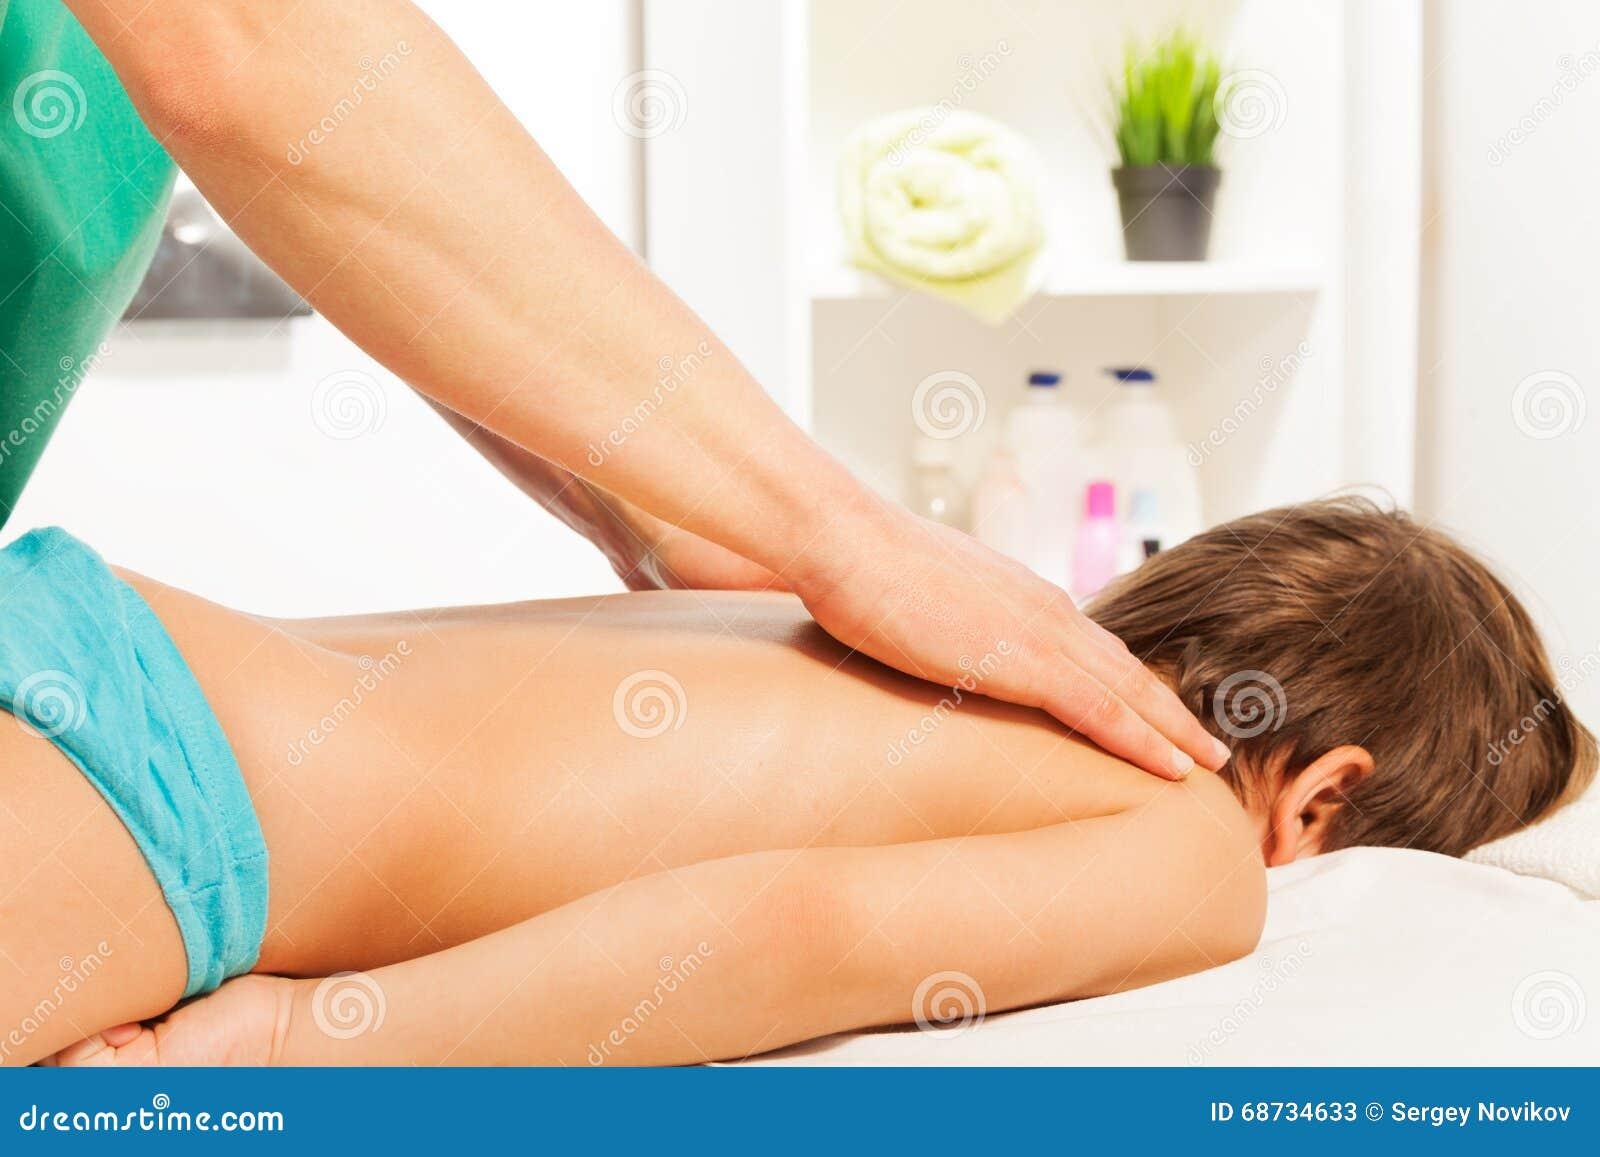 erotic massage star acupressure orem